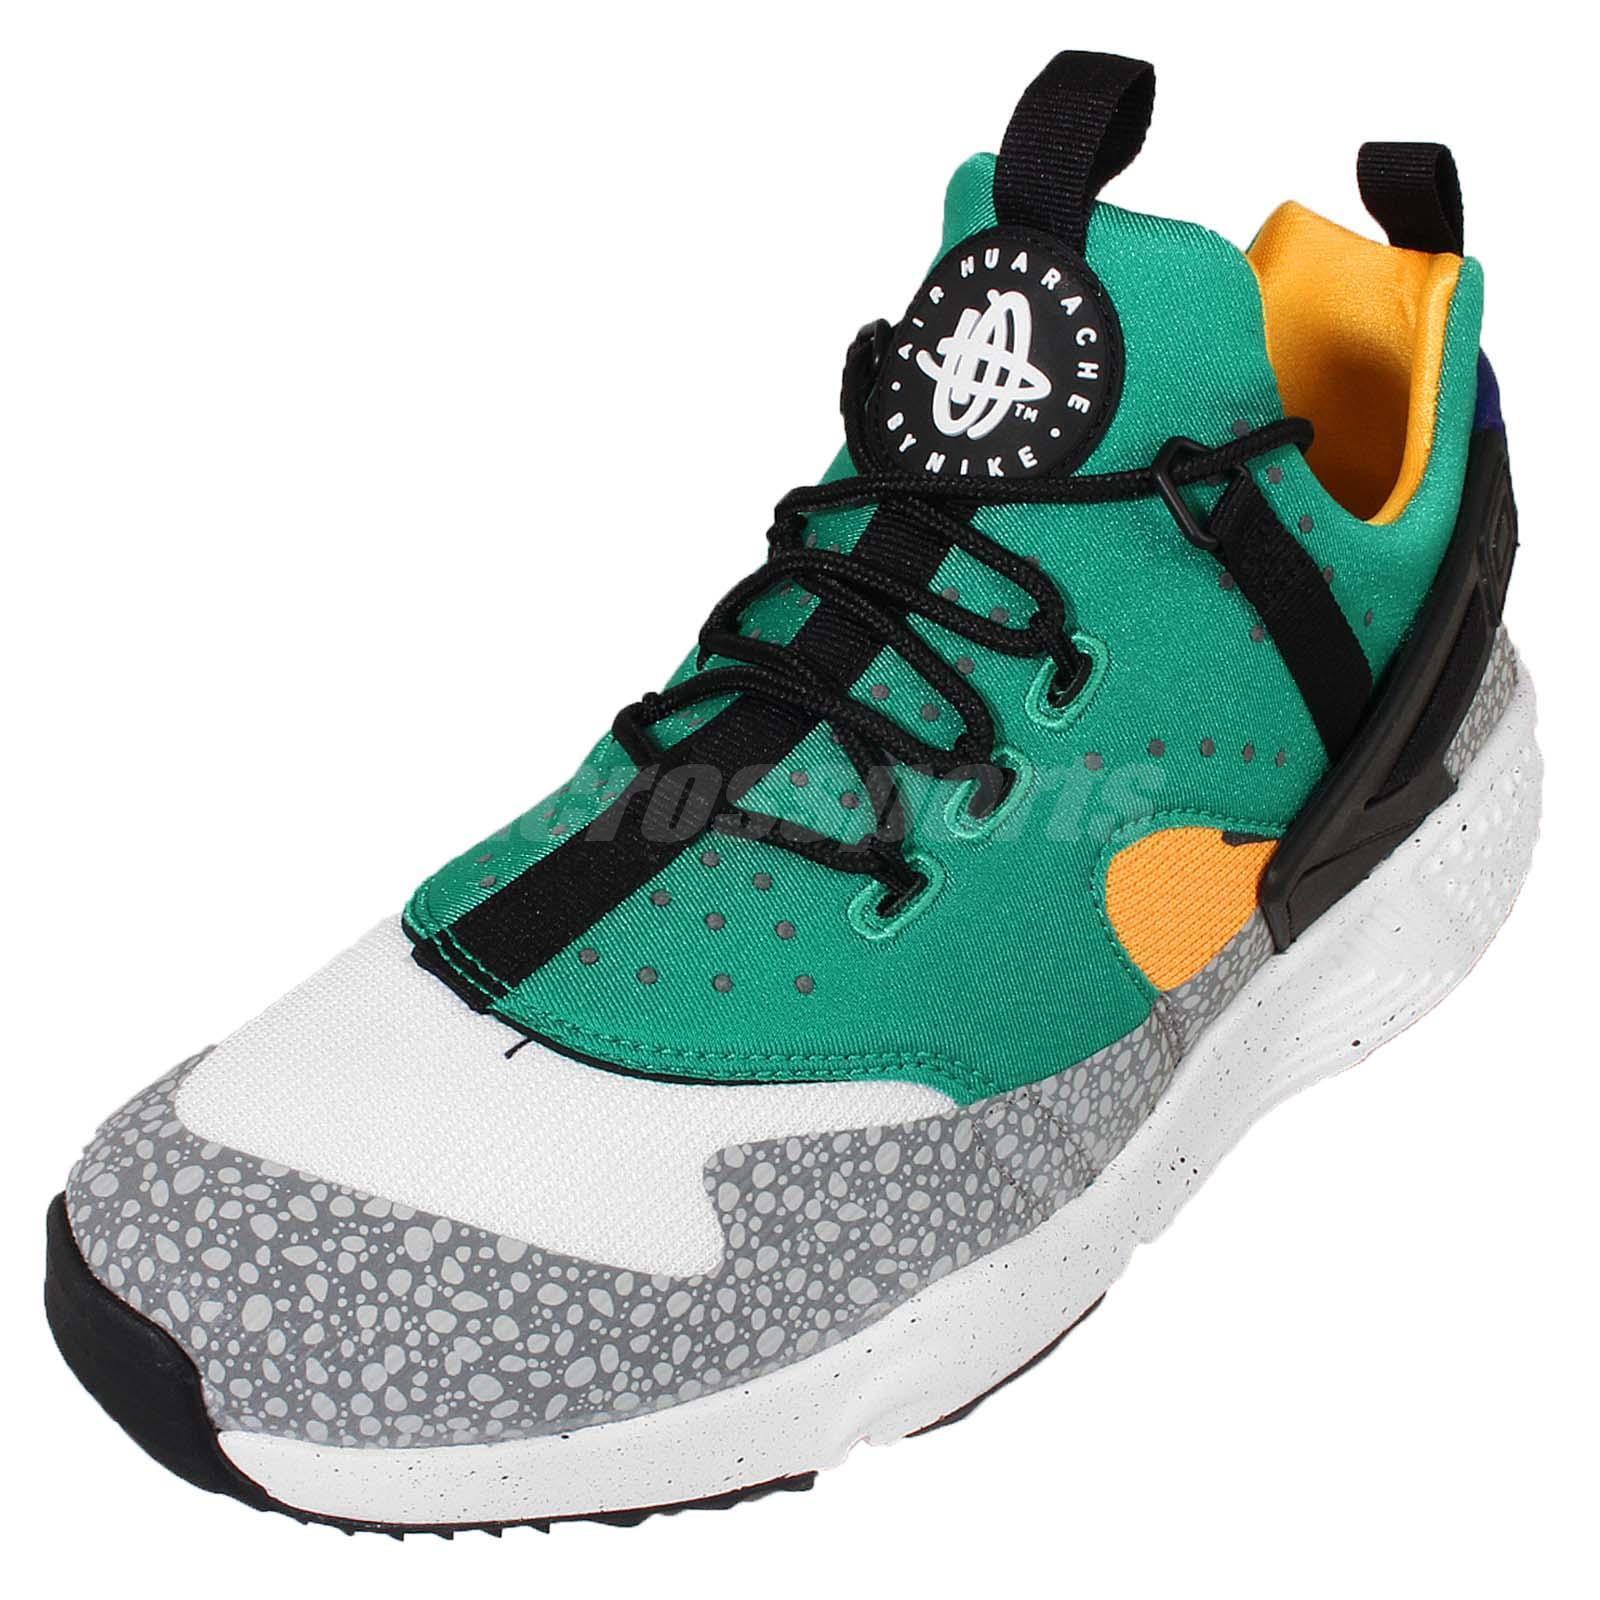 d9f55c88c47 Mens Nike Air Huarache Utility Premium Size 9.5 White Green Shoes 806979 103  for sale online